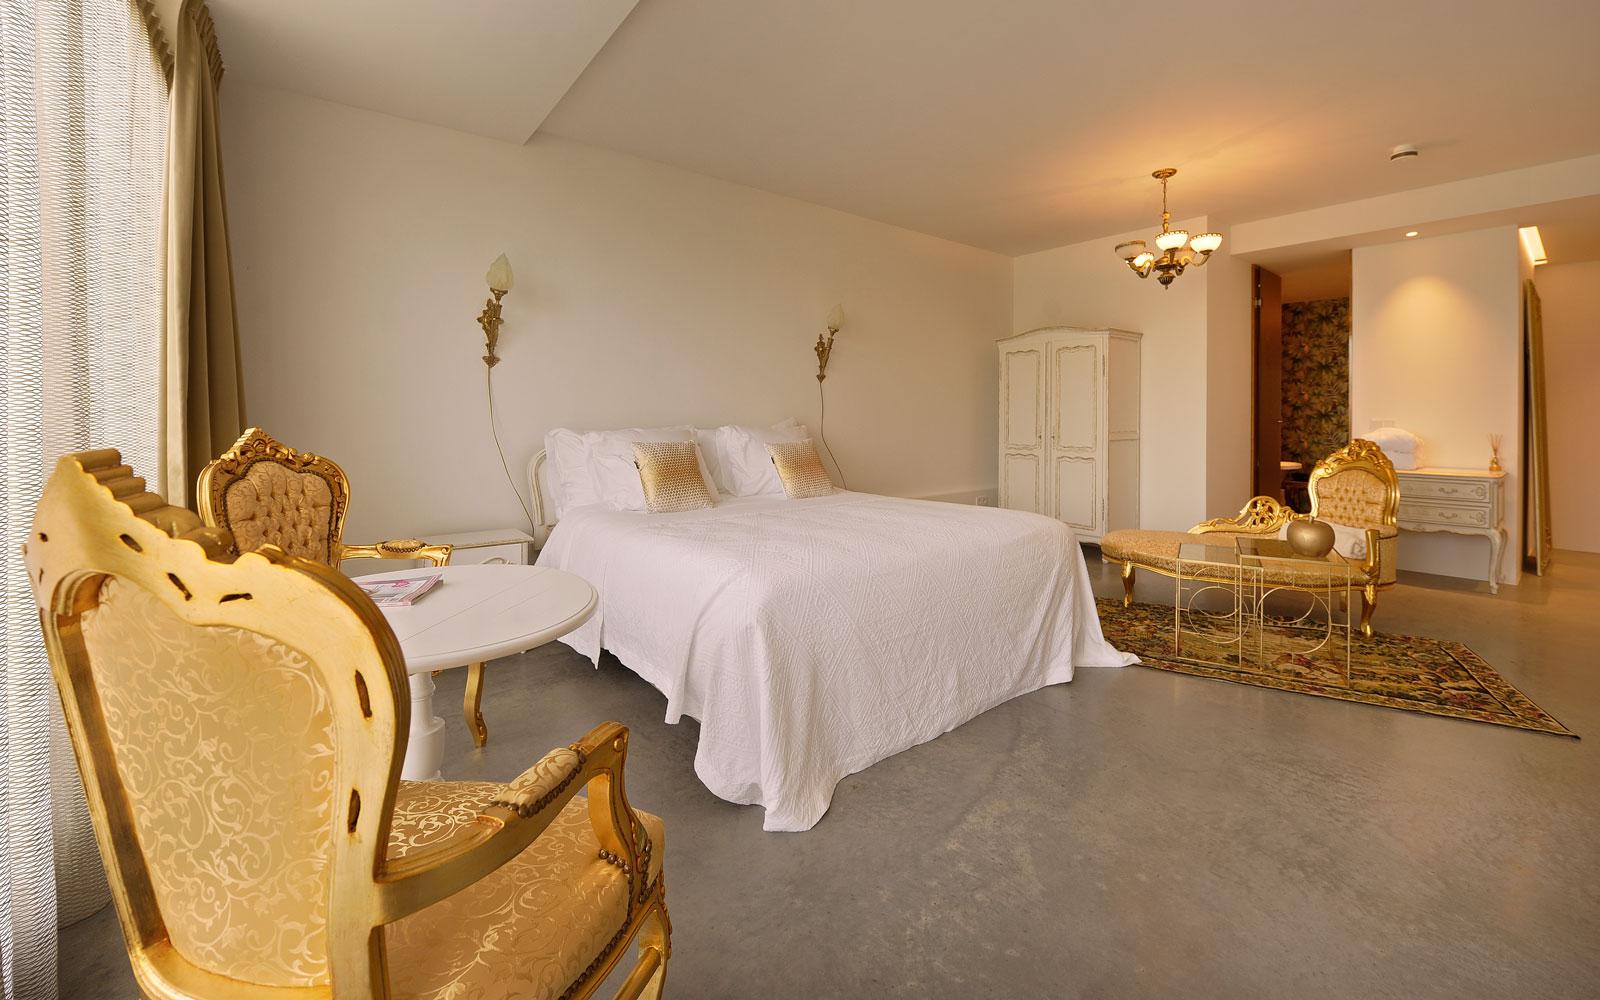 Gouden kamer, slaapkamer, hotel, goud, Auping bed, La Marquise, Hertroijs Architekten